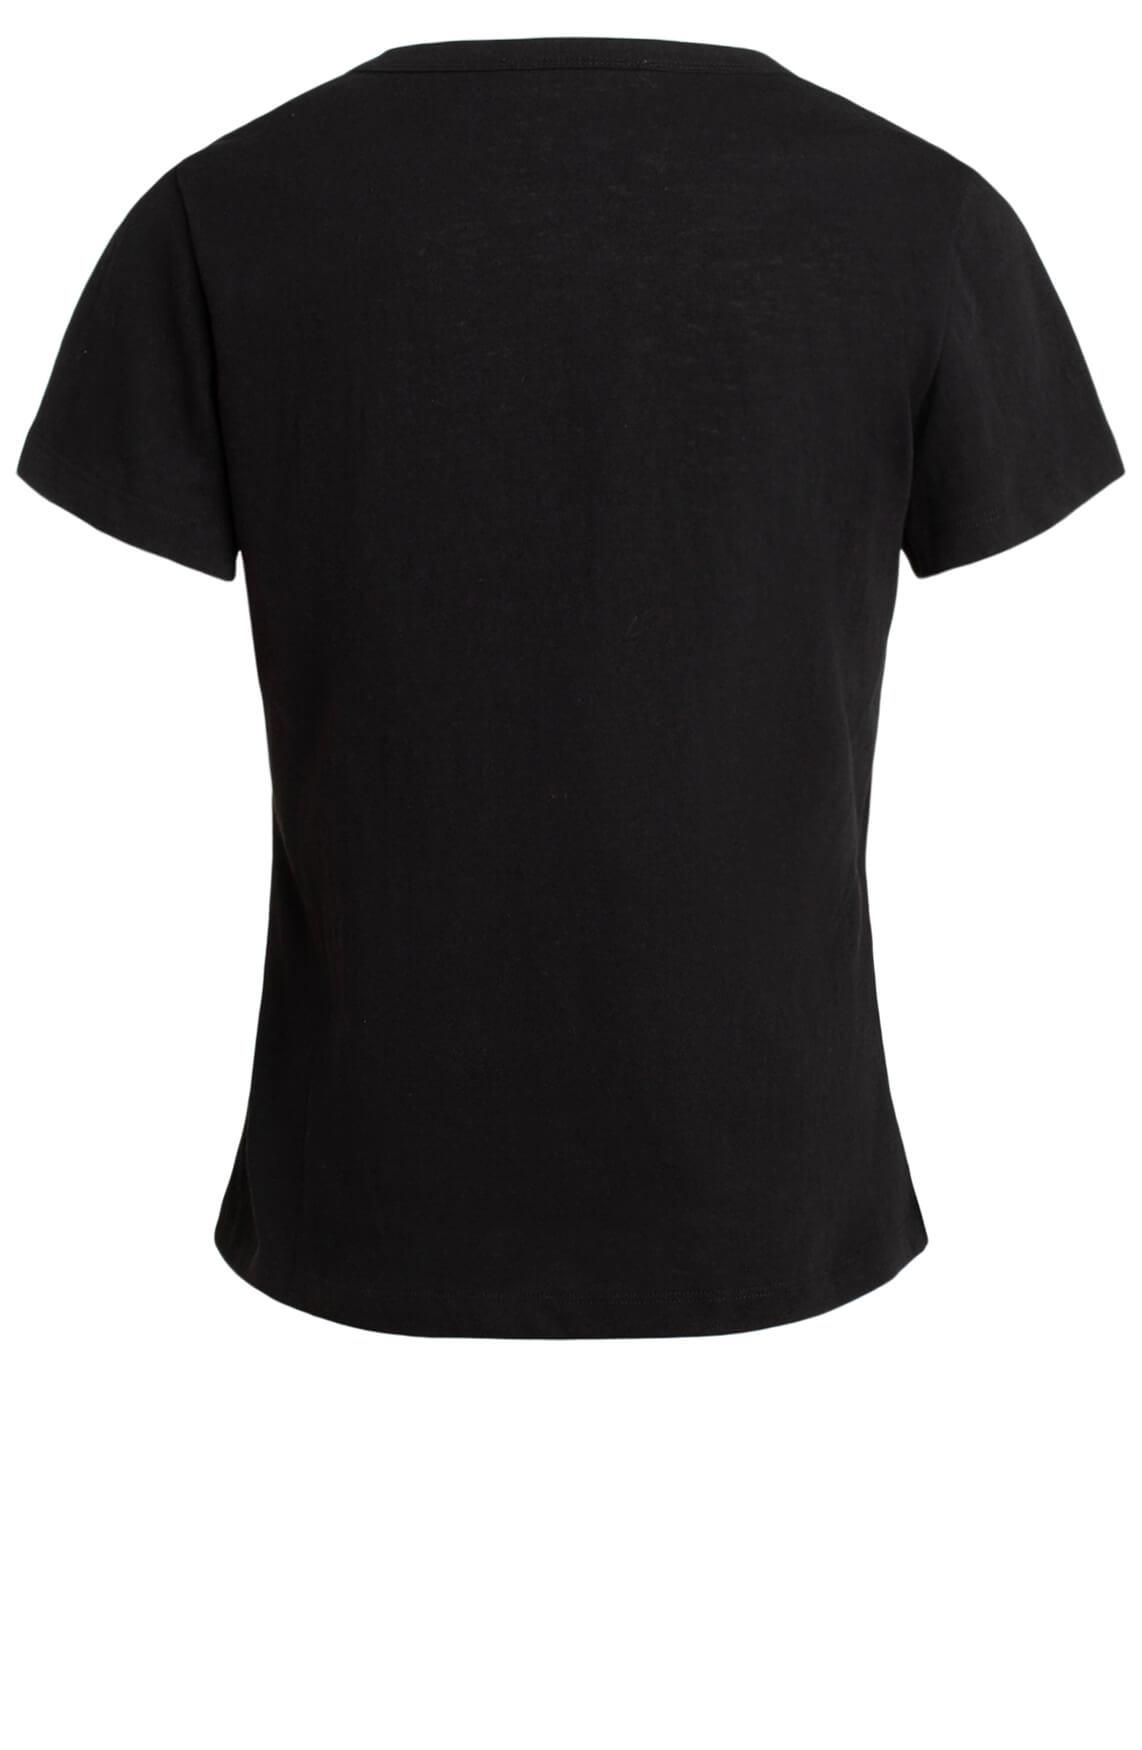 Co Couture Dames Linnen O-neck shirt zwart